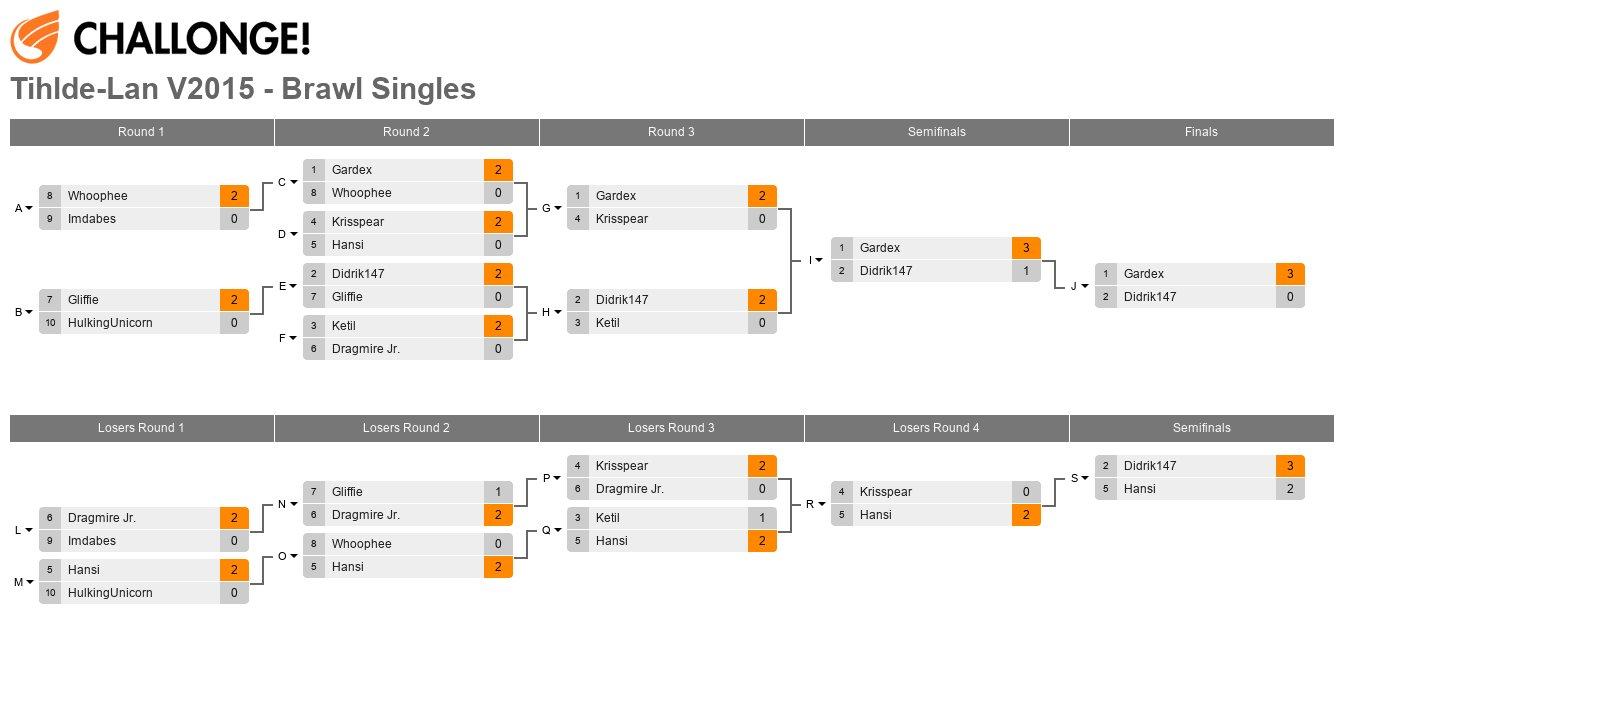 Tihlde-Lan V2015 - Brawl Singles